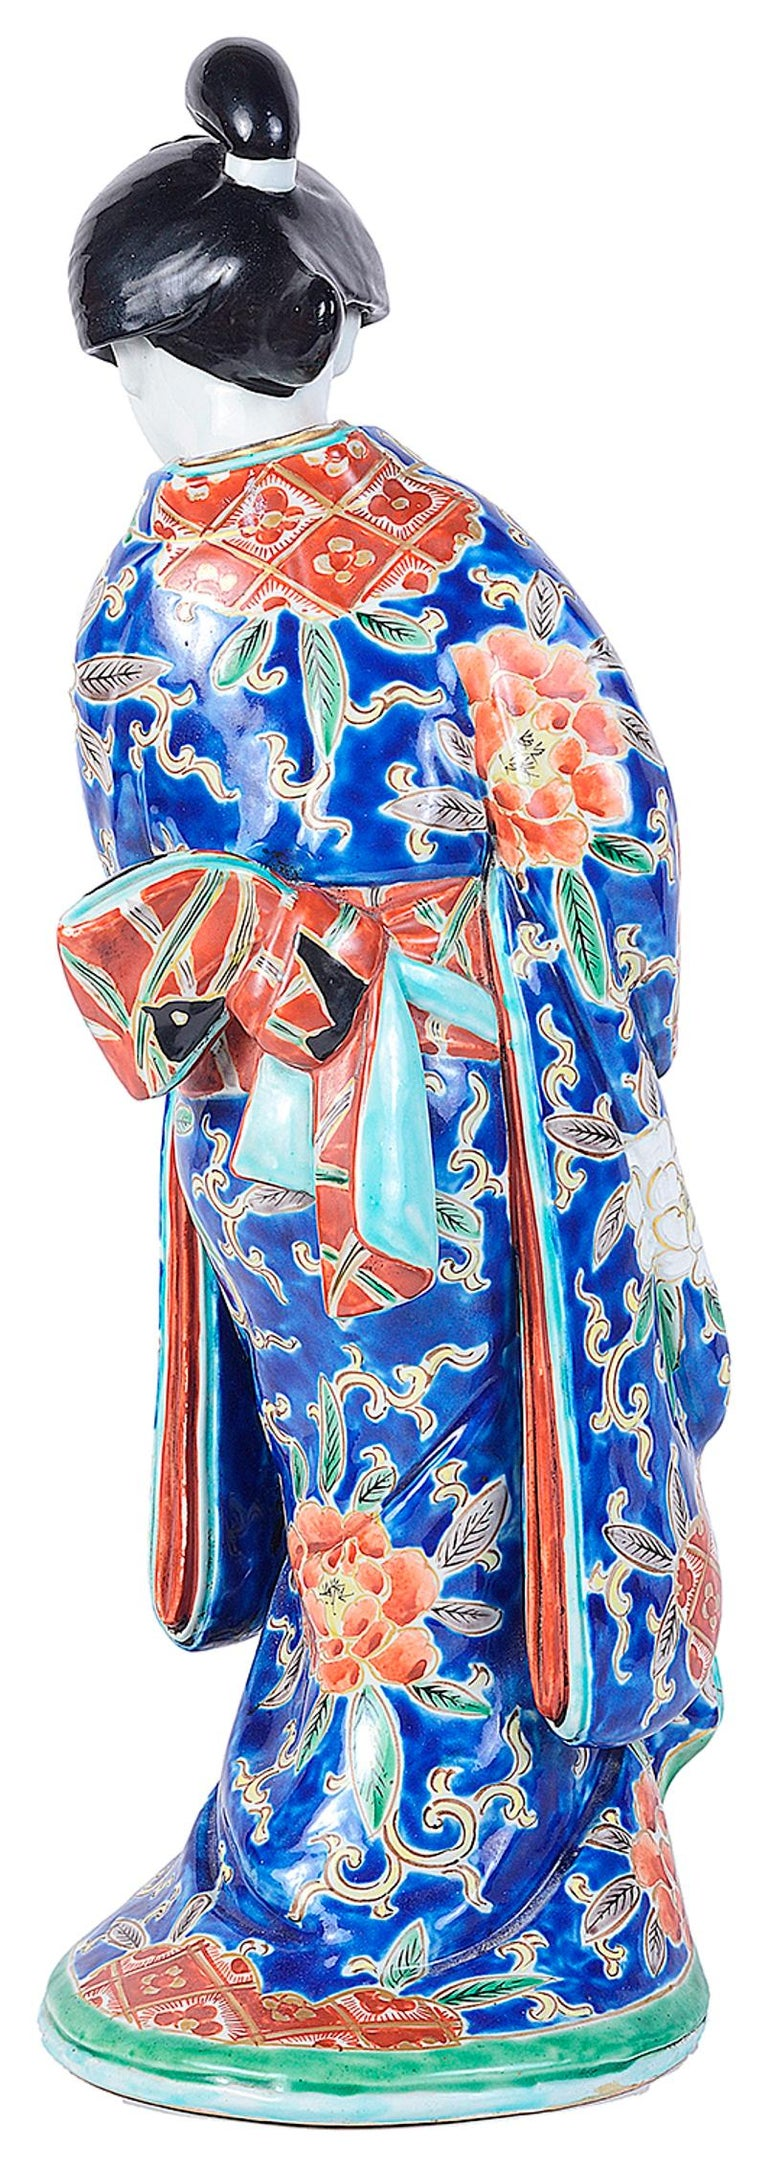 A good quality early 20th century Imari porcelain figure of a Geisha, having a wonderfully exotic colored kimono.